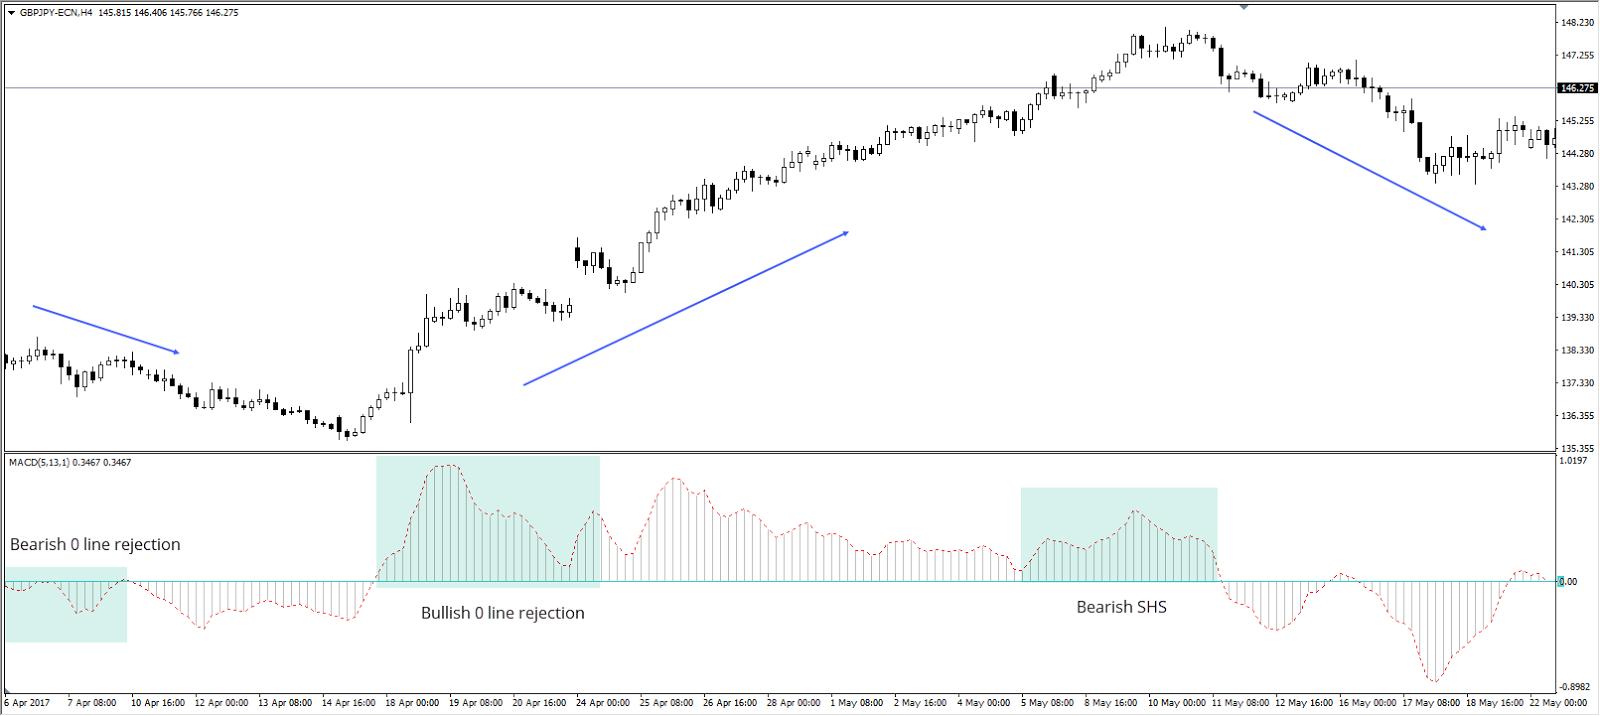 MACD Bullish 0 Line Rejection on GBP/JPY H4 Chart